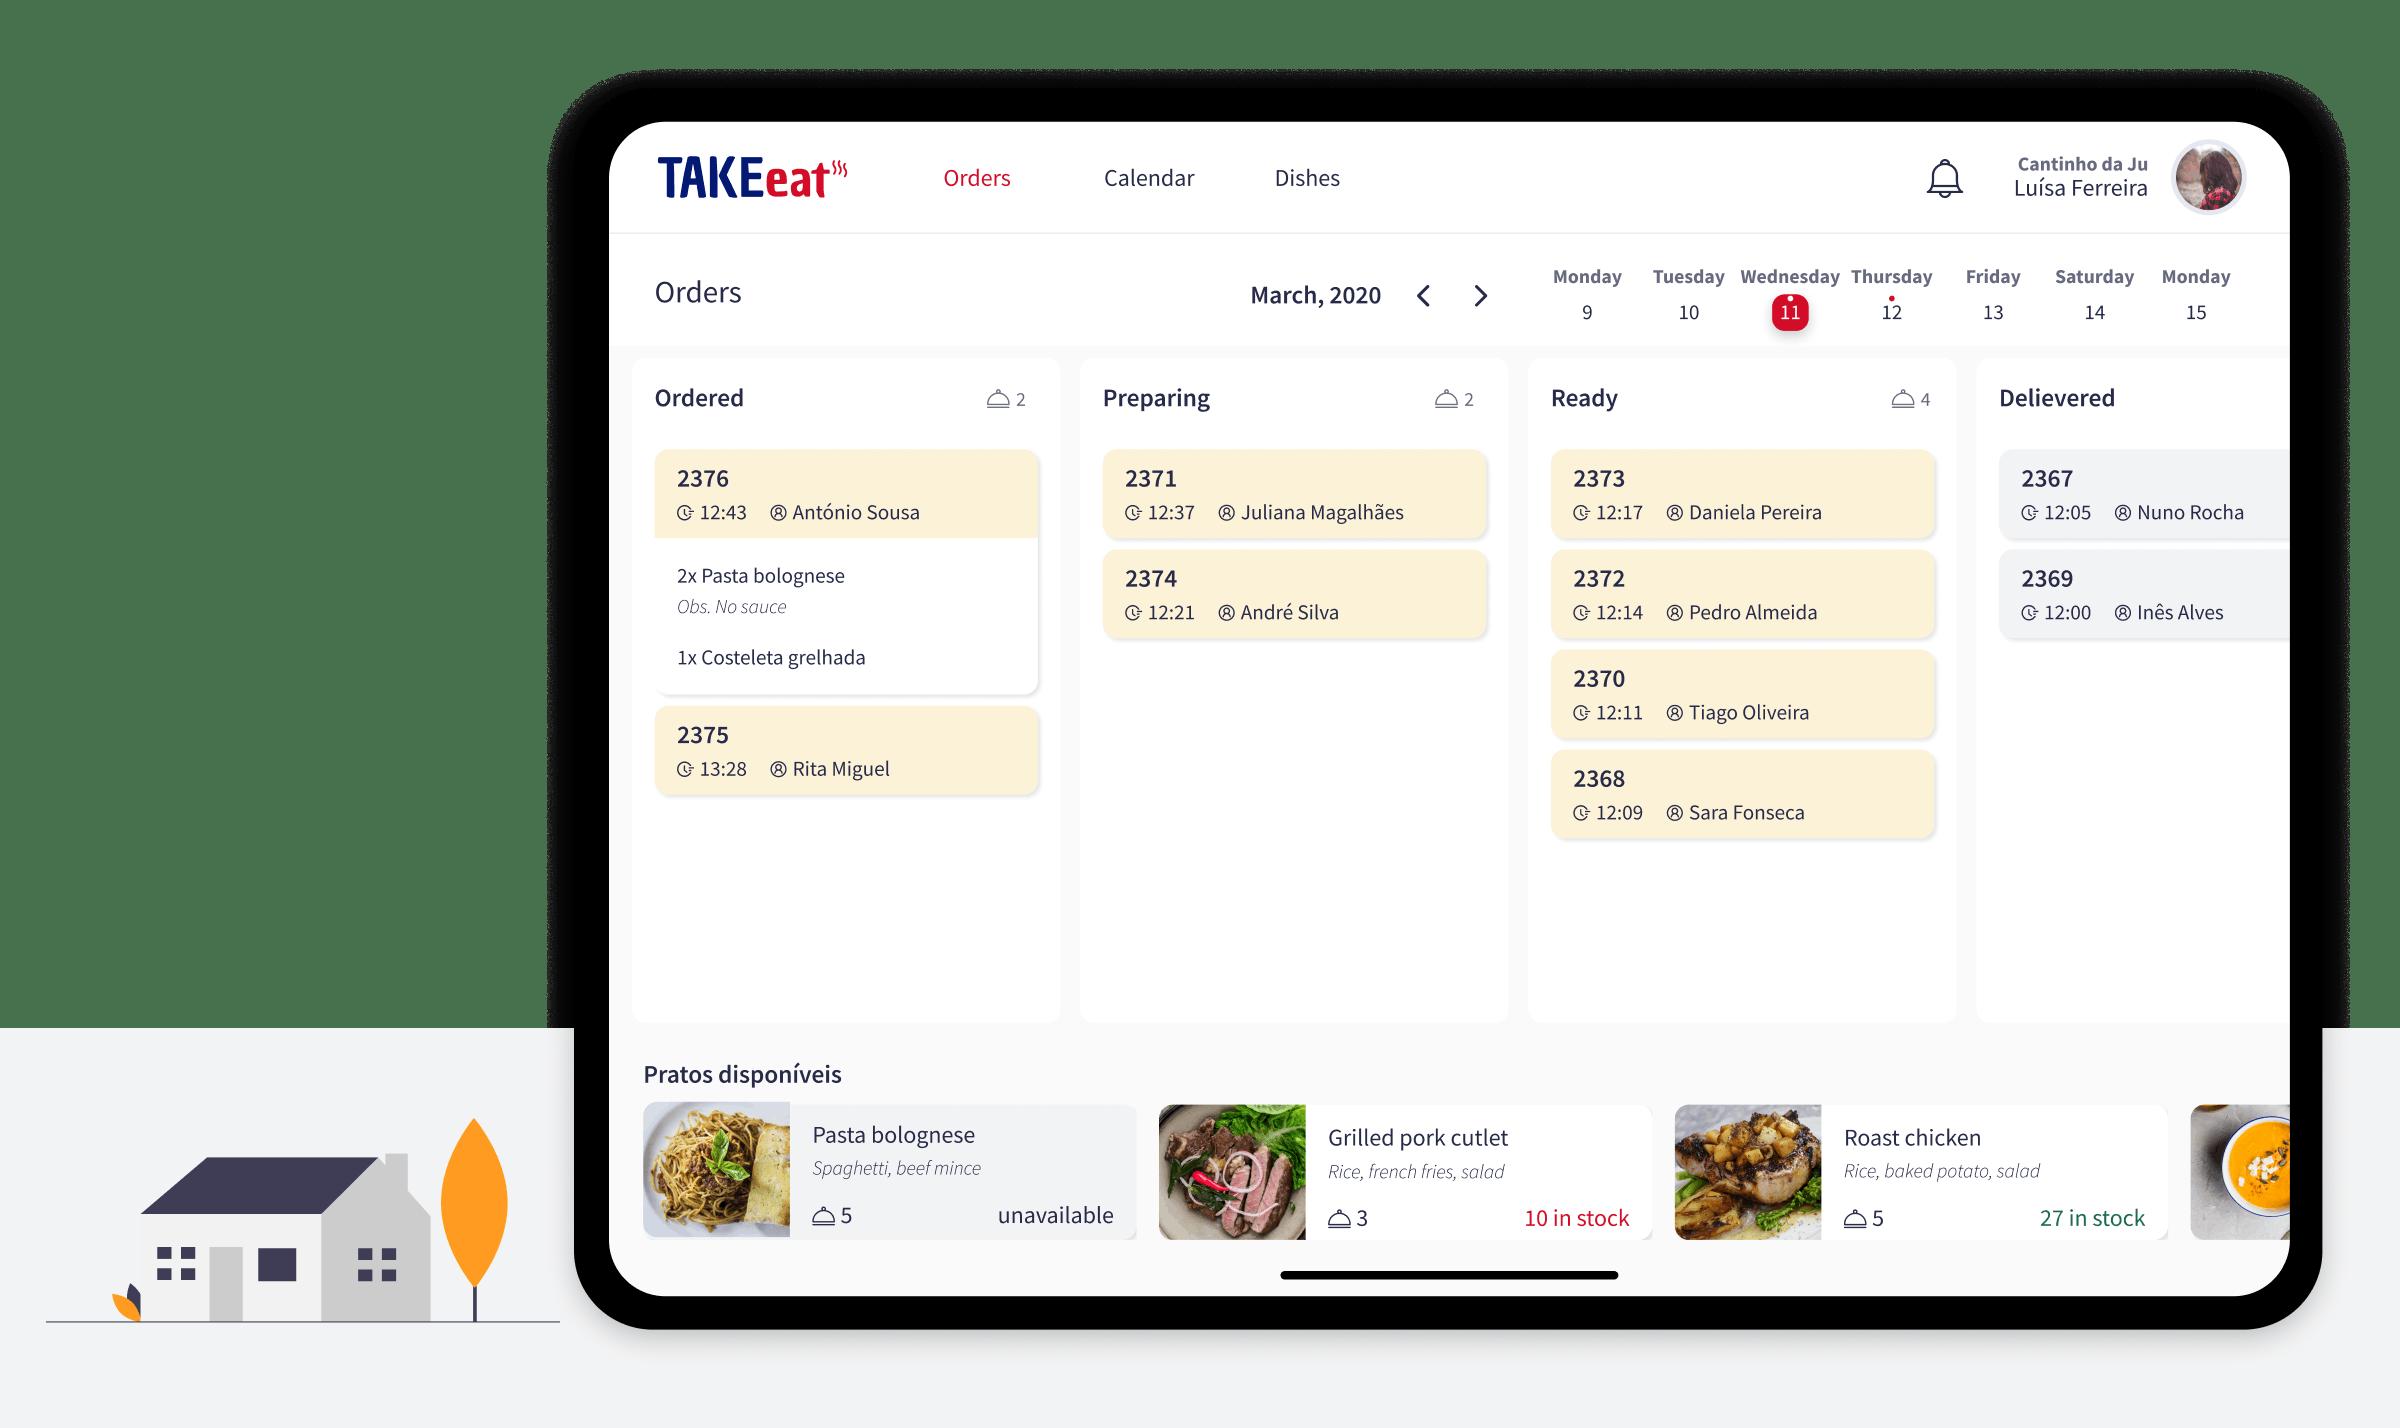 take-eat restaurant dashboard by Mosano